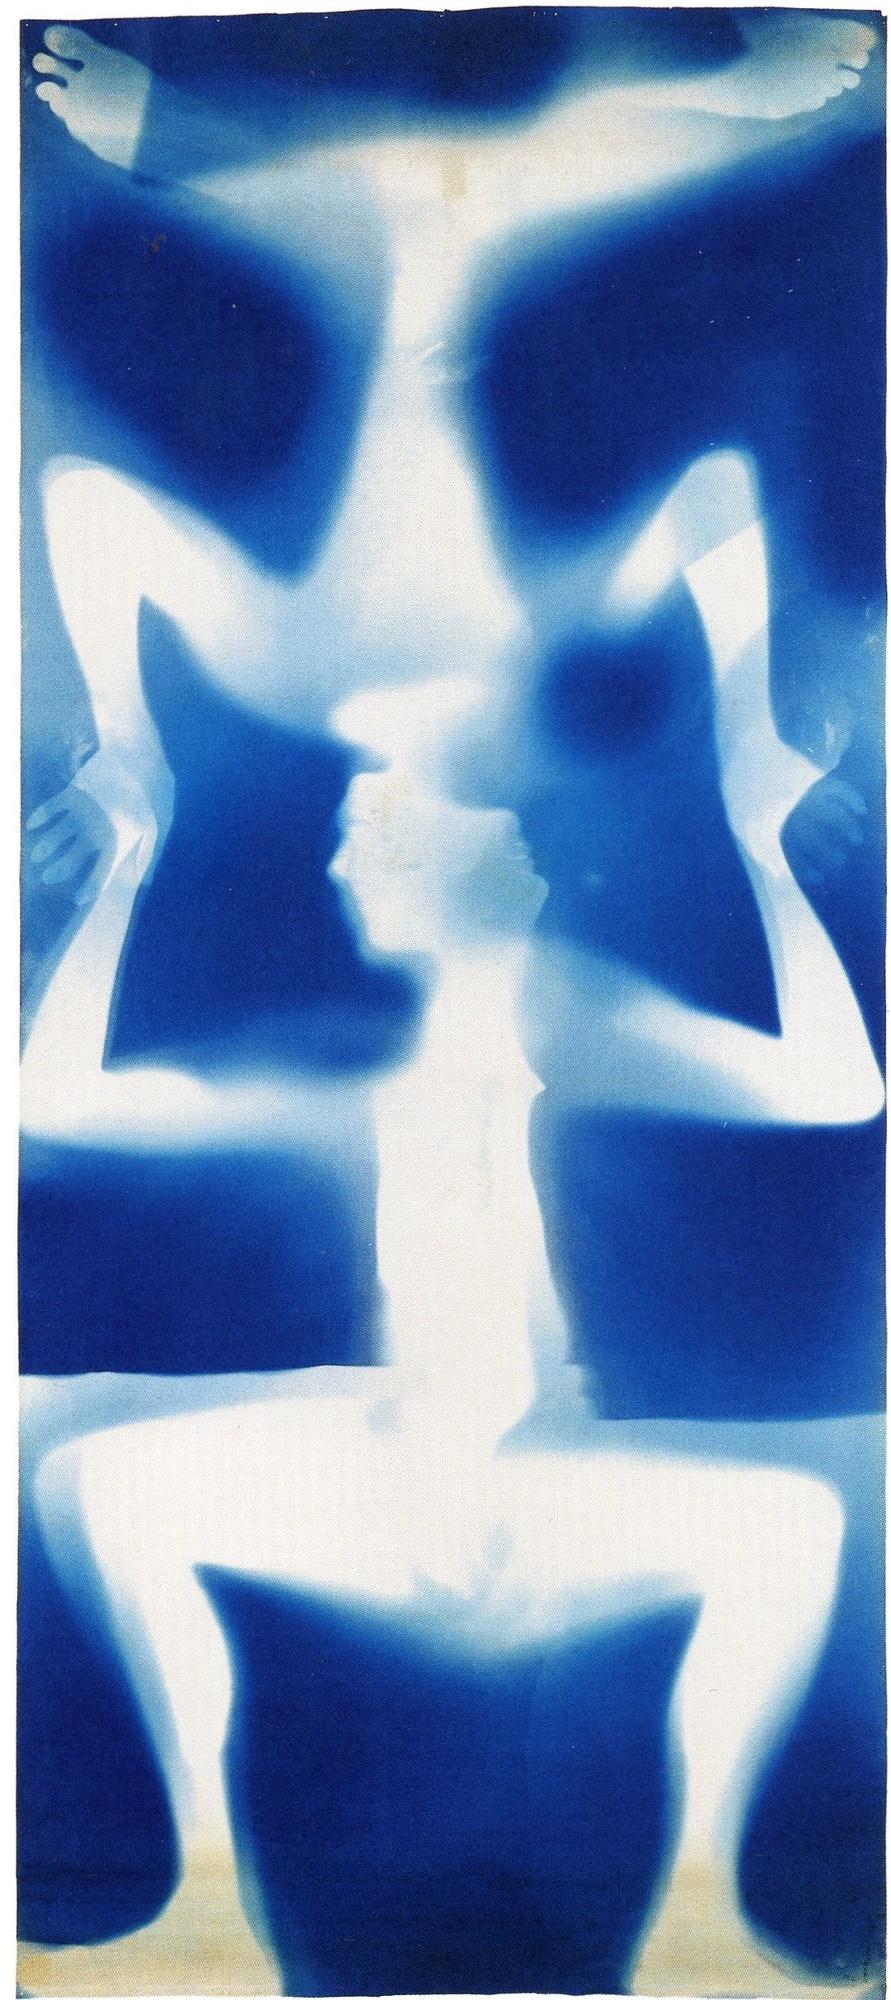 Robert Rauschenberg and Susan Weil. Untitled (Double Rauschenberg). © 1950 www.moma.org